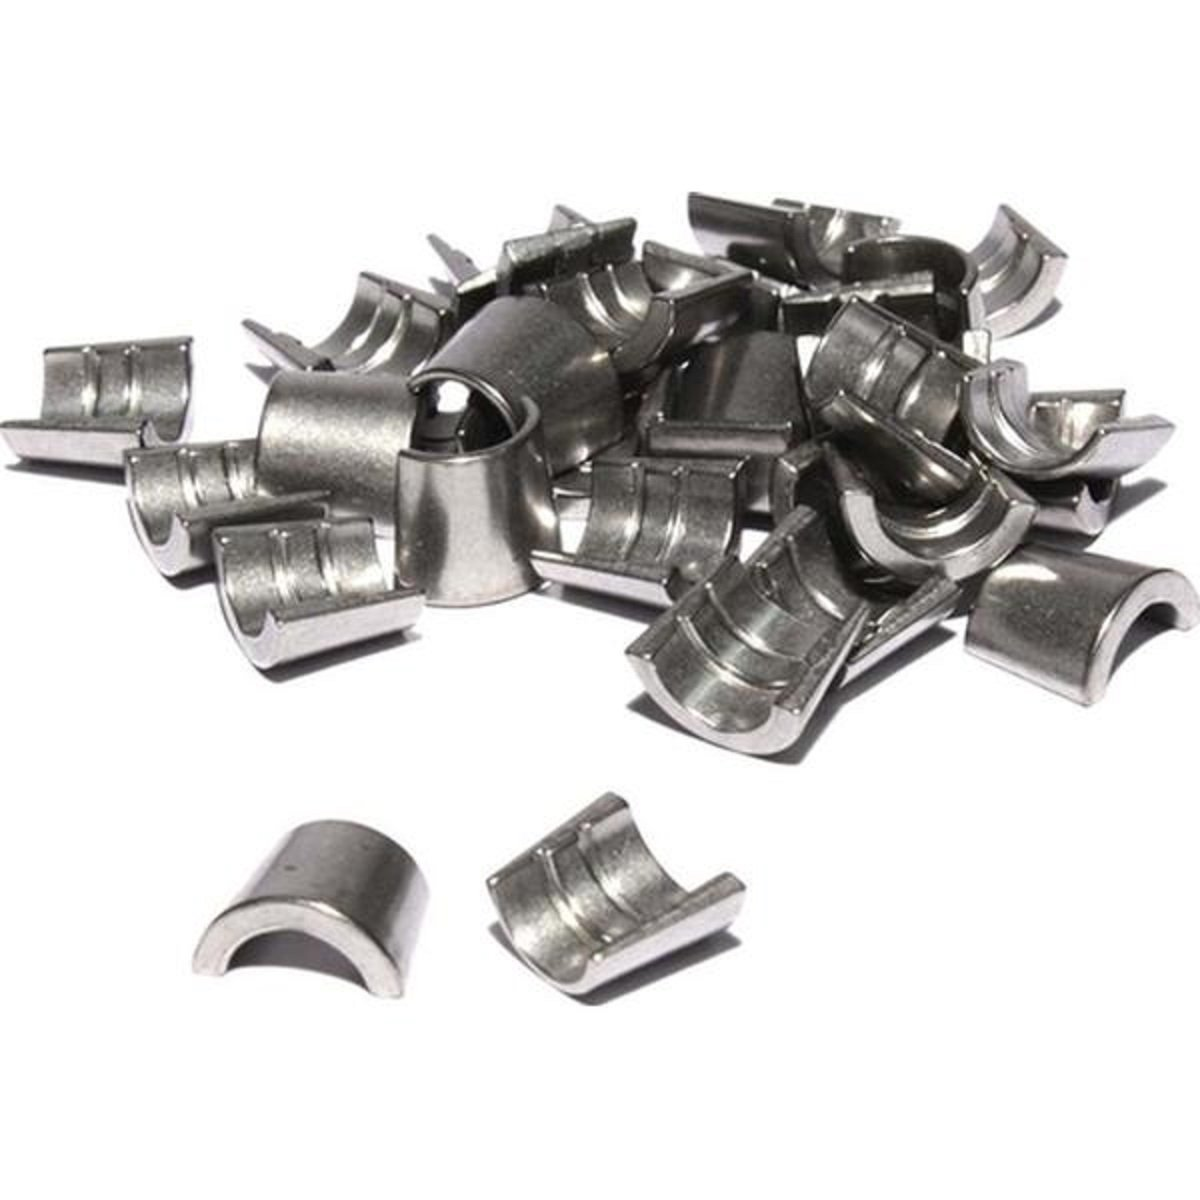 Engine Rebuilders Special.200 Quantity 11//32 valve locks from Elgin for 11//32 Stem Valves 200 Qty